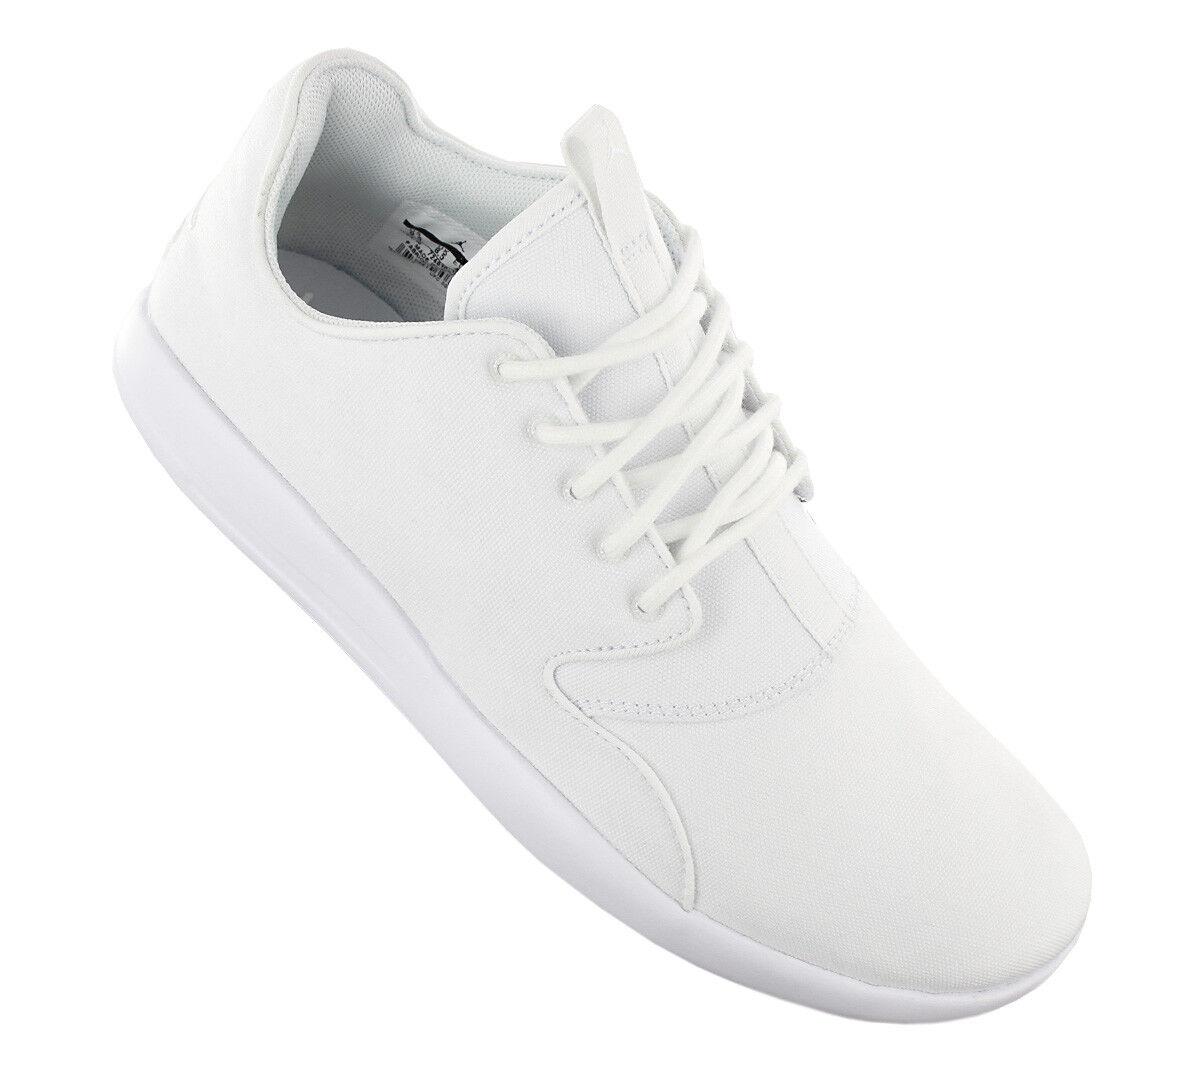 NEW Nike Air Jordan Eclipse 724010-100 Men''s shoes Trainers Sneakers SALE